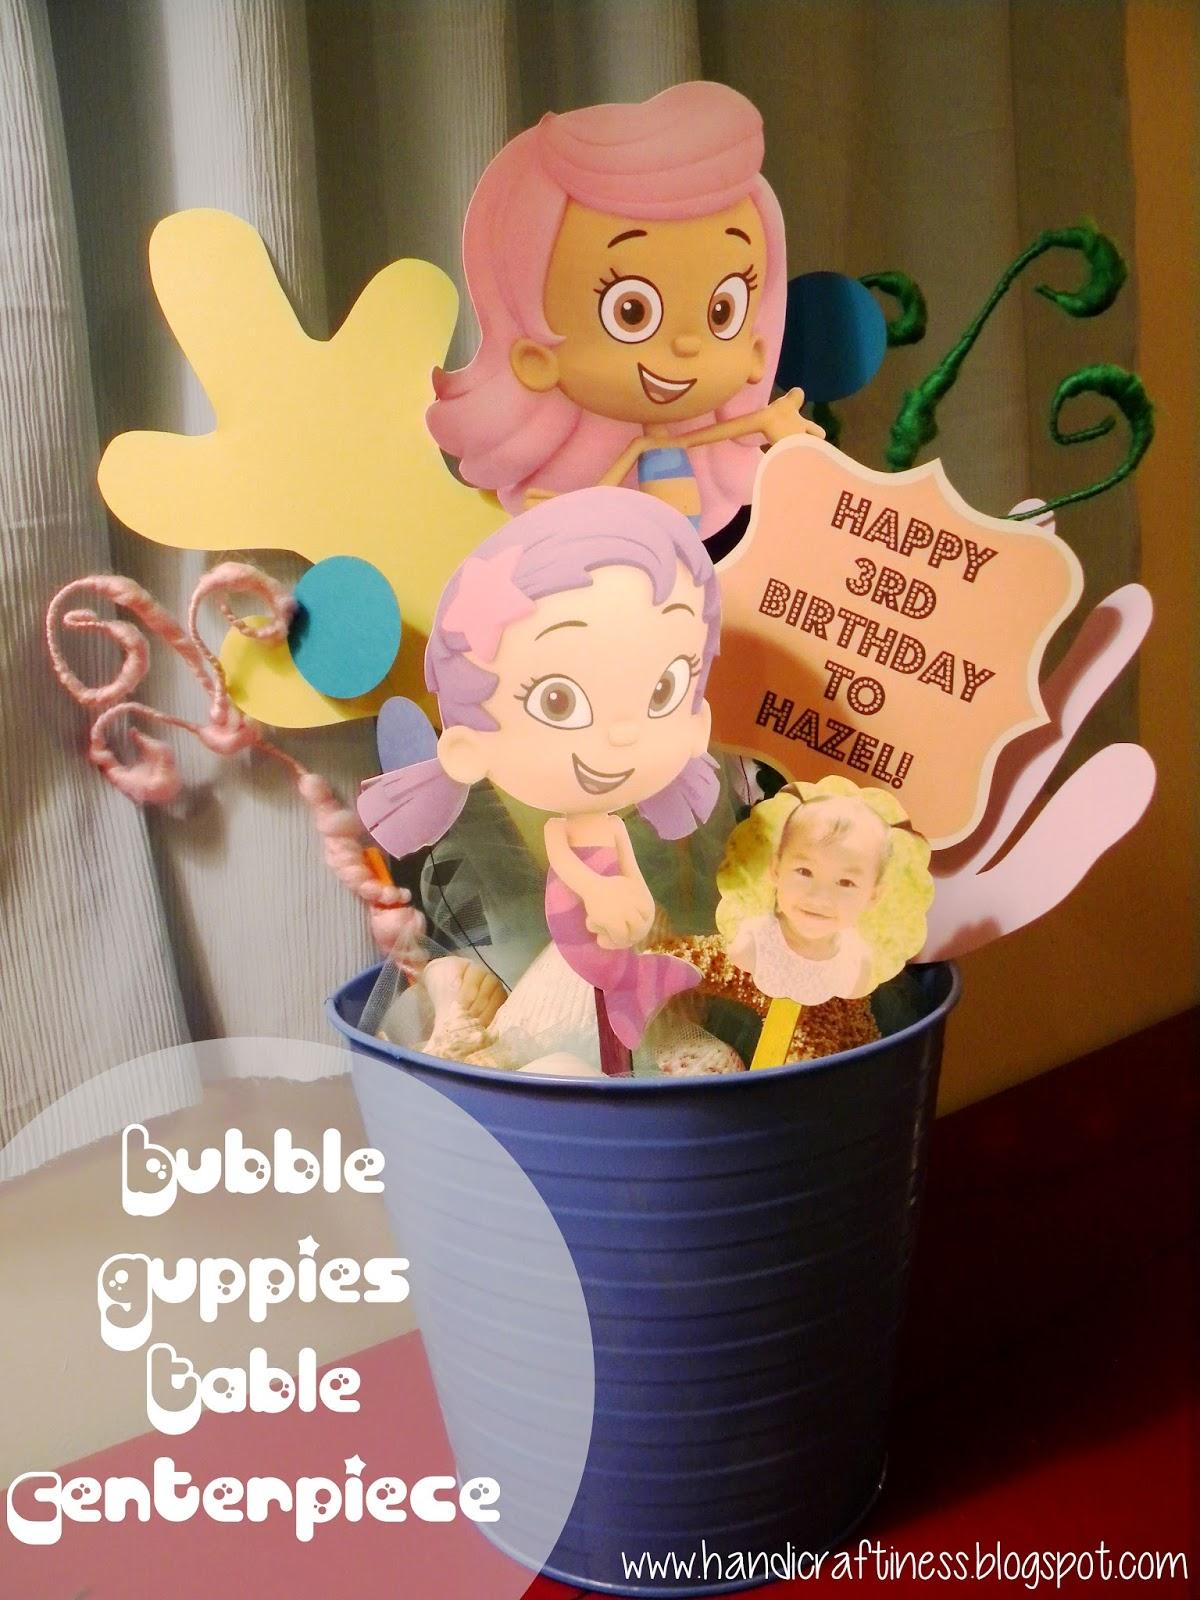 The pretty kitty studio bubble guppies diy party decor - Bubble guppies center pieces ...